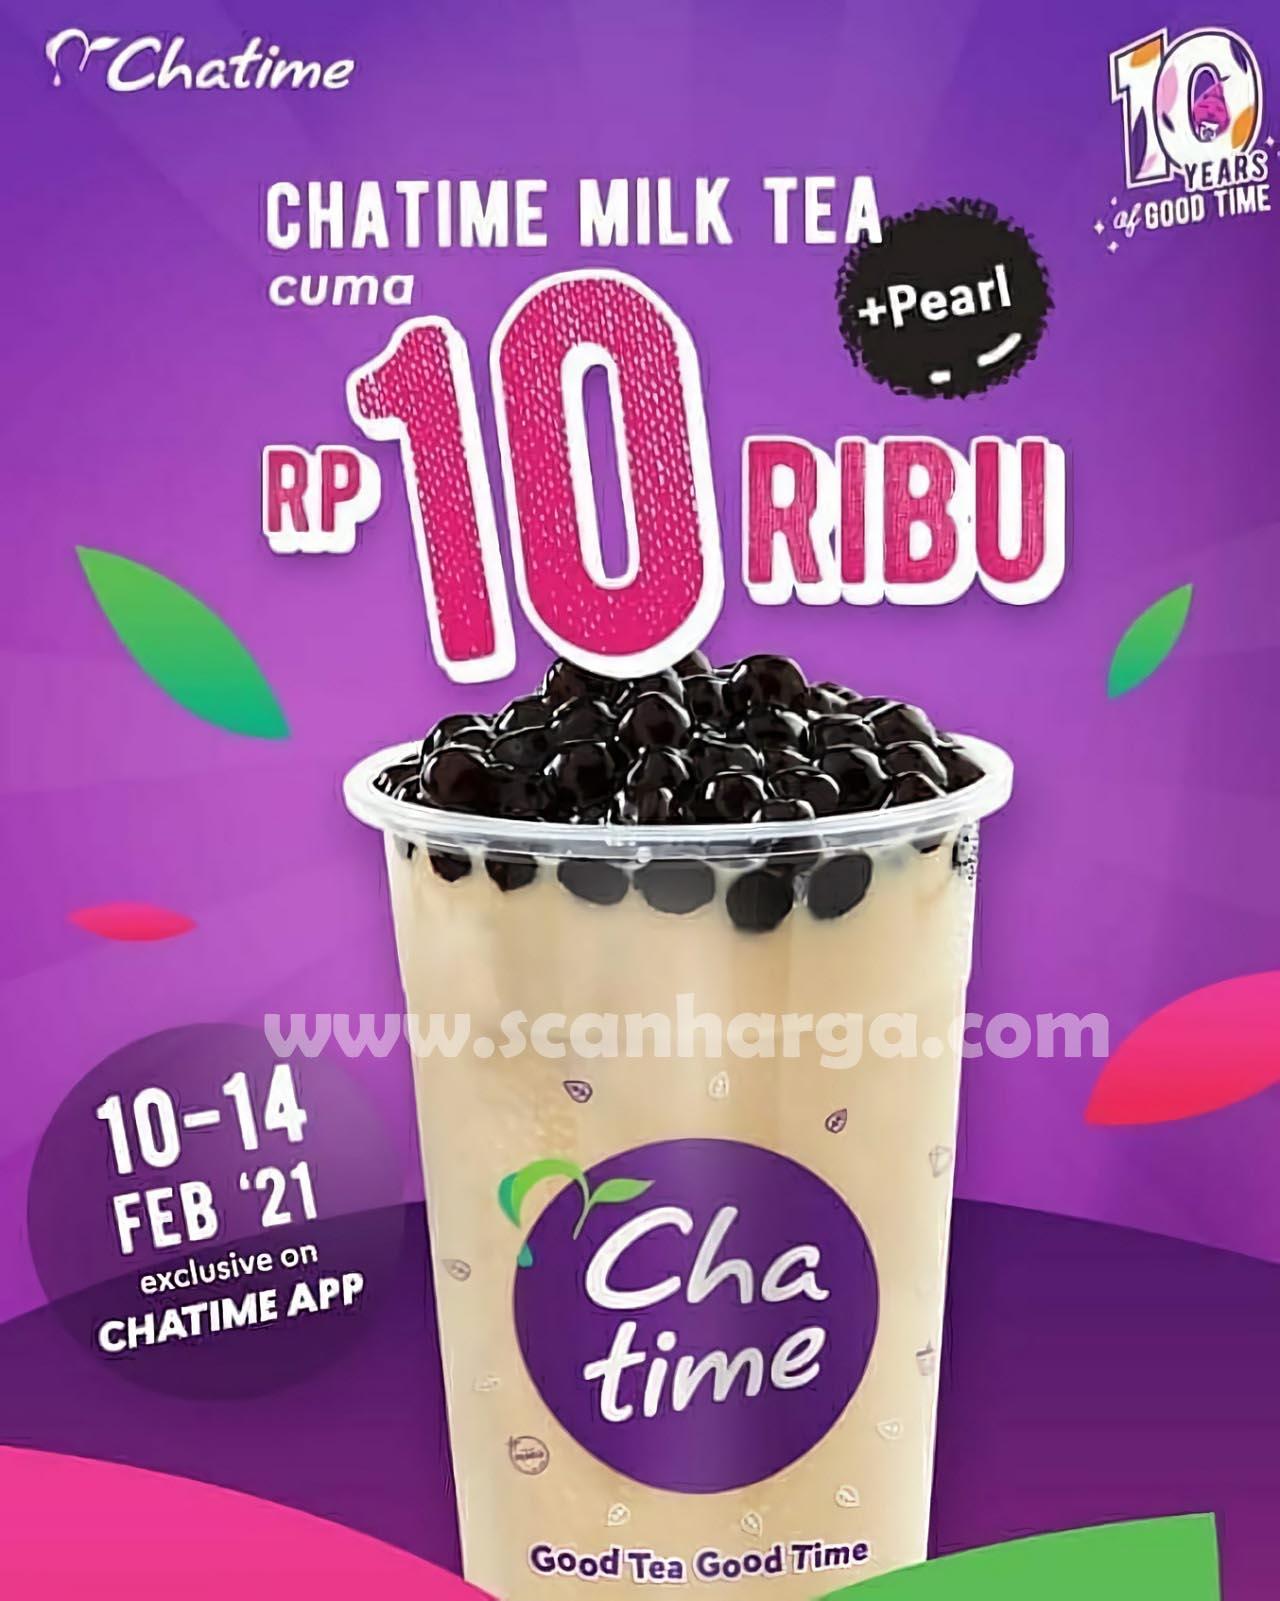 CHATIME Promo MILK TEA + PEARL! Harga cuma Rp 10.000